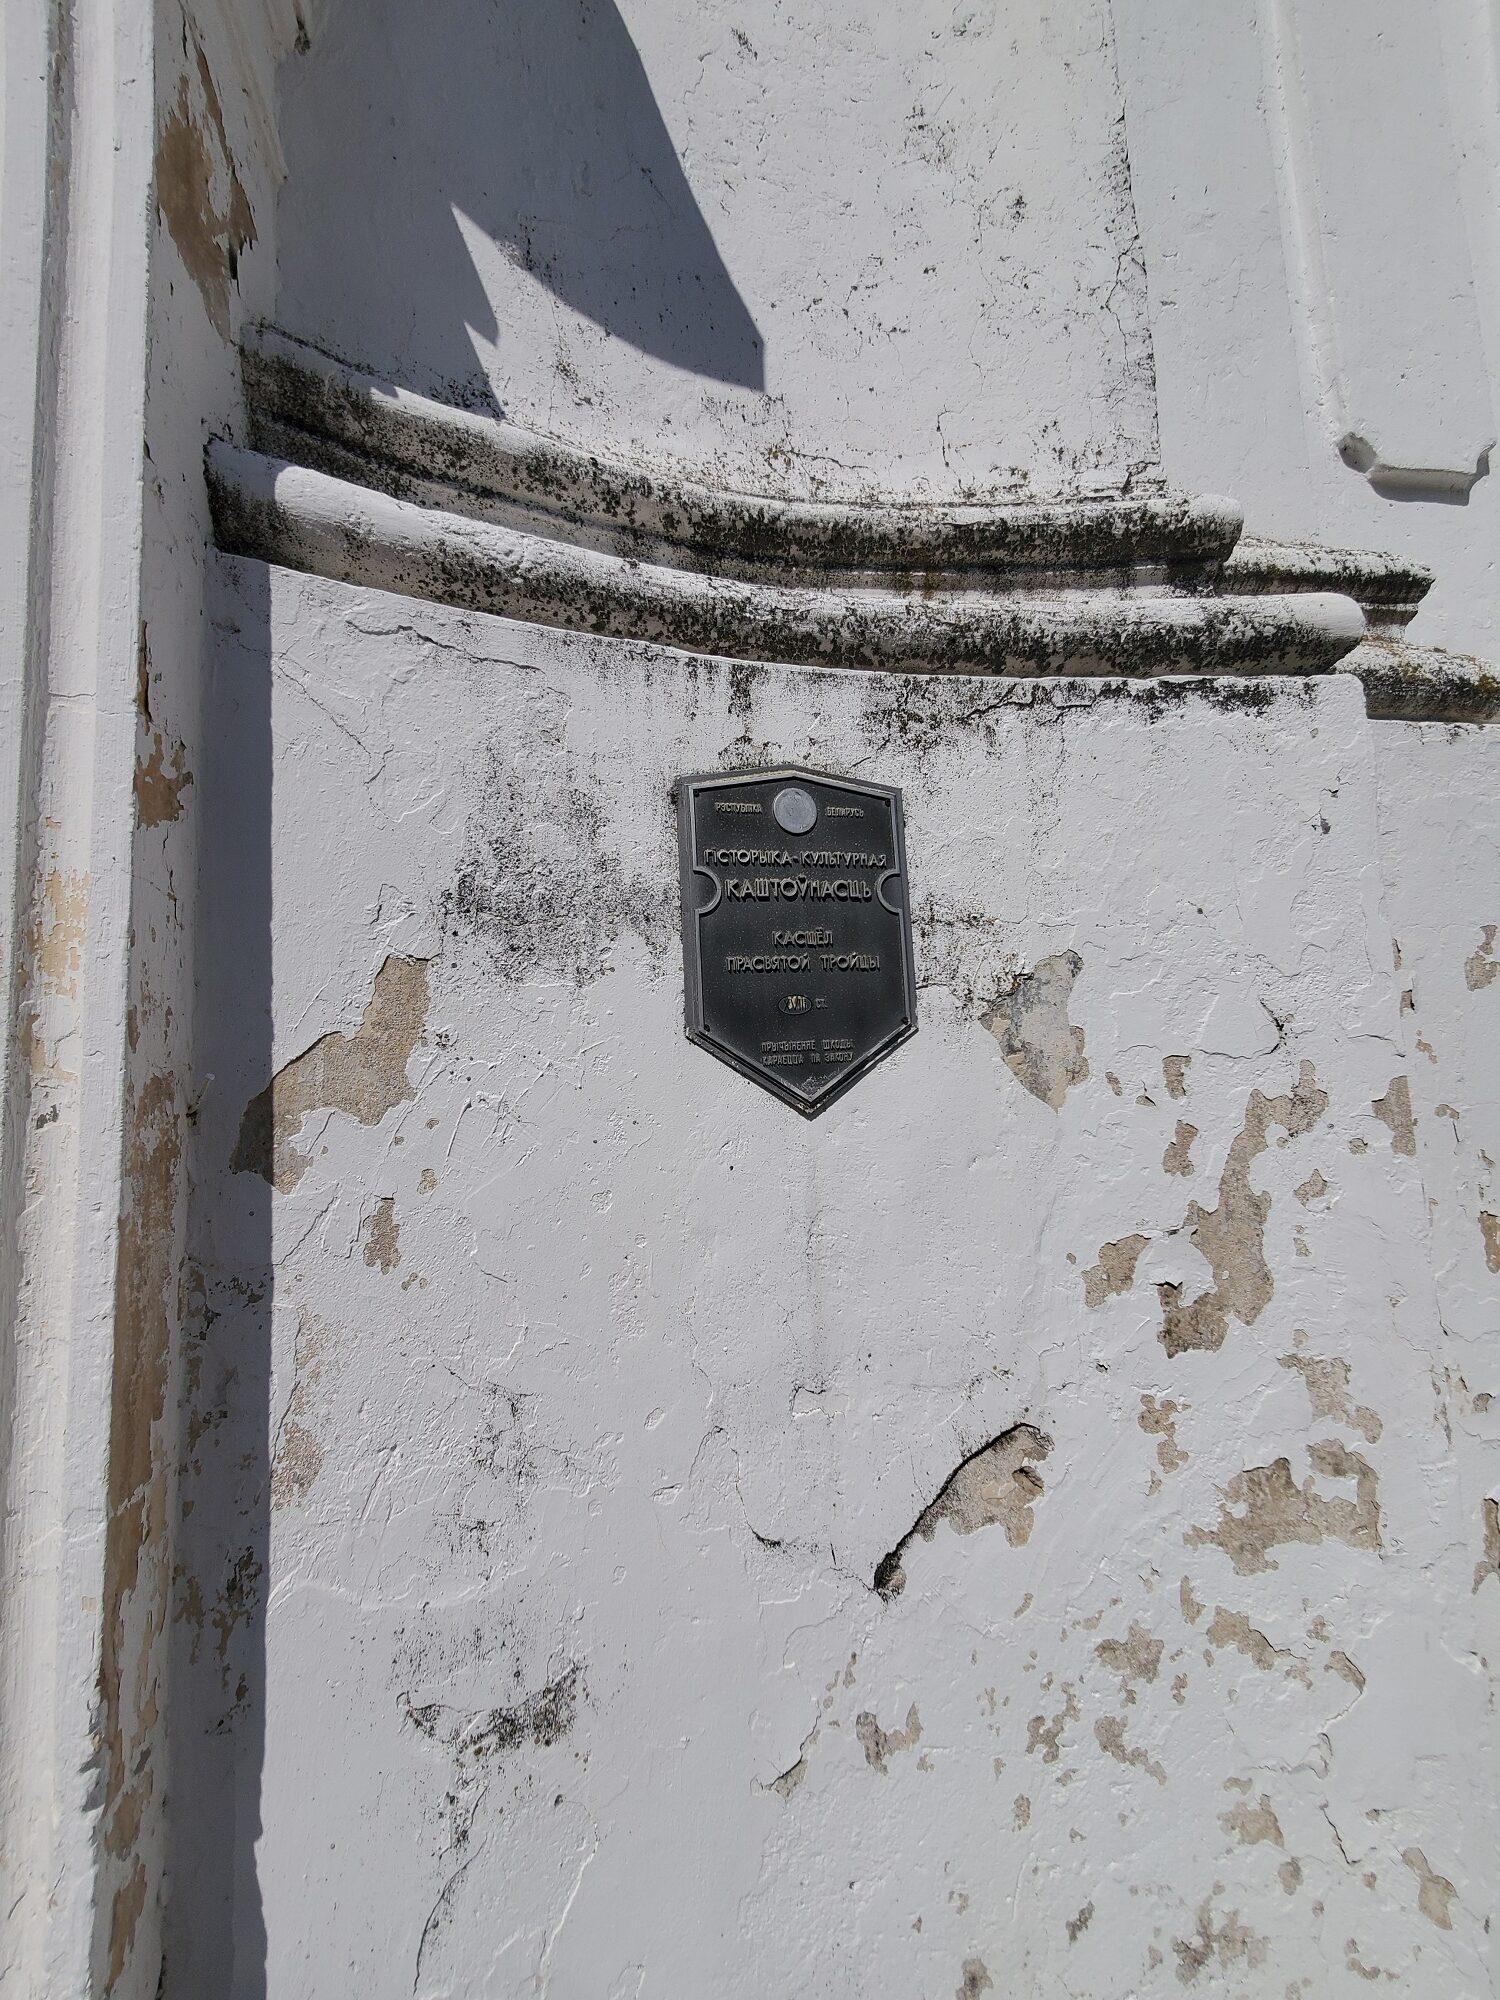 20200606 150846 rotated - Костел Святой Троицы в деревне Дуниловичи